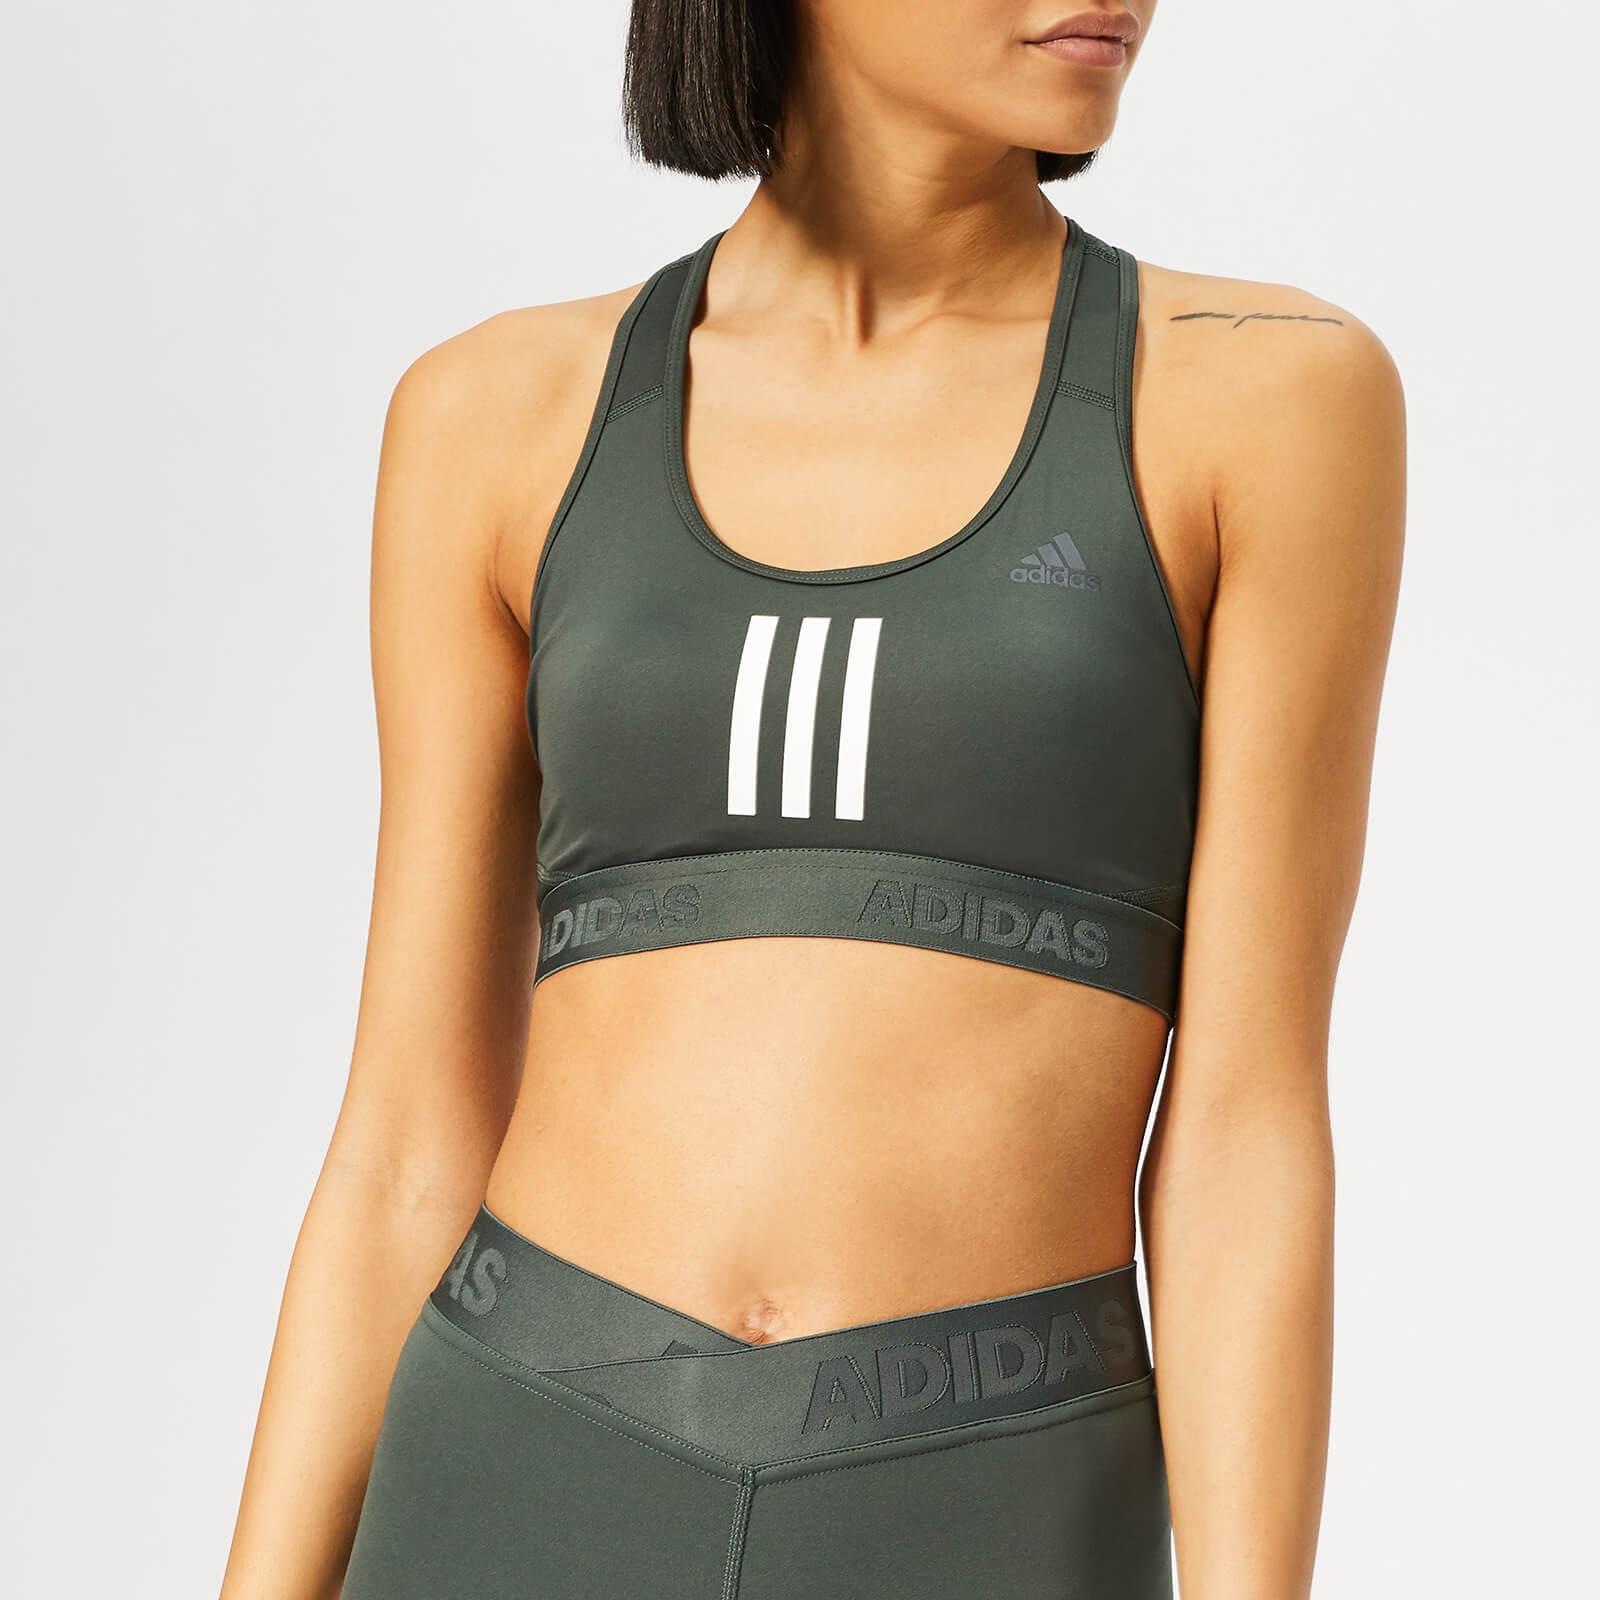 adidas Women's Don't Rest 3 Stripes Bra - Legend Ivy - S - Green